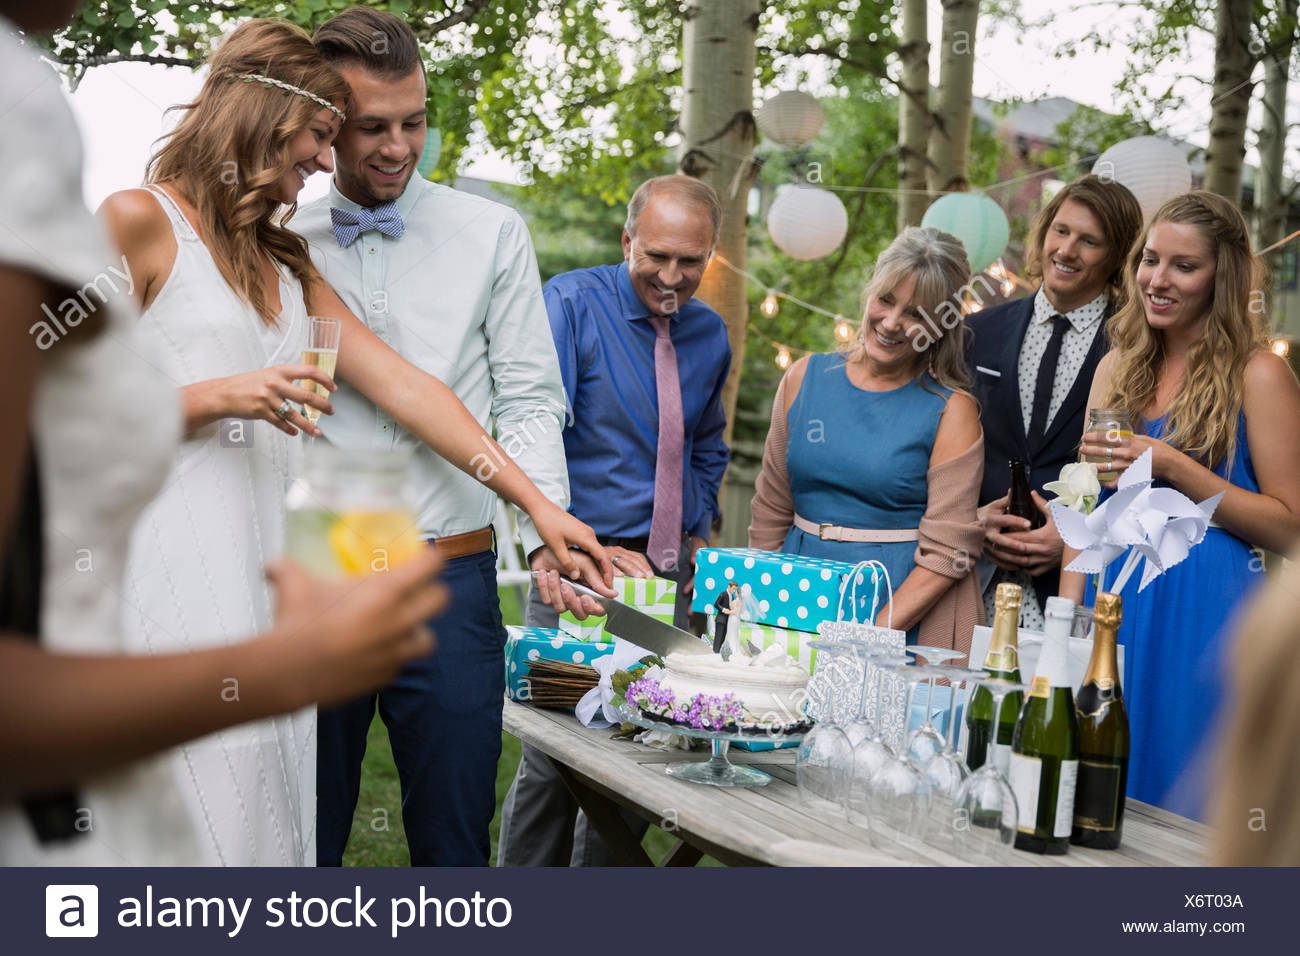 Bride and groom cutting cake backyard wedding reception - Stock Image